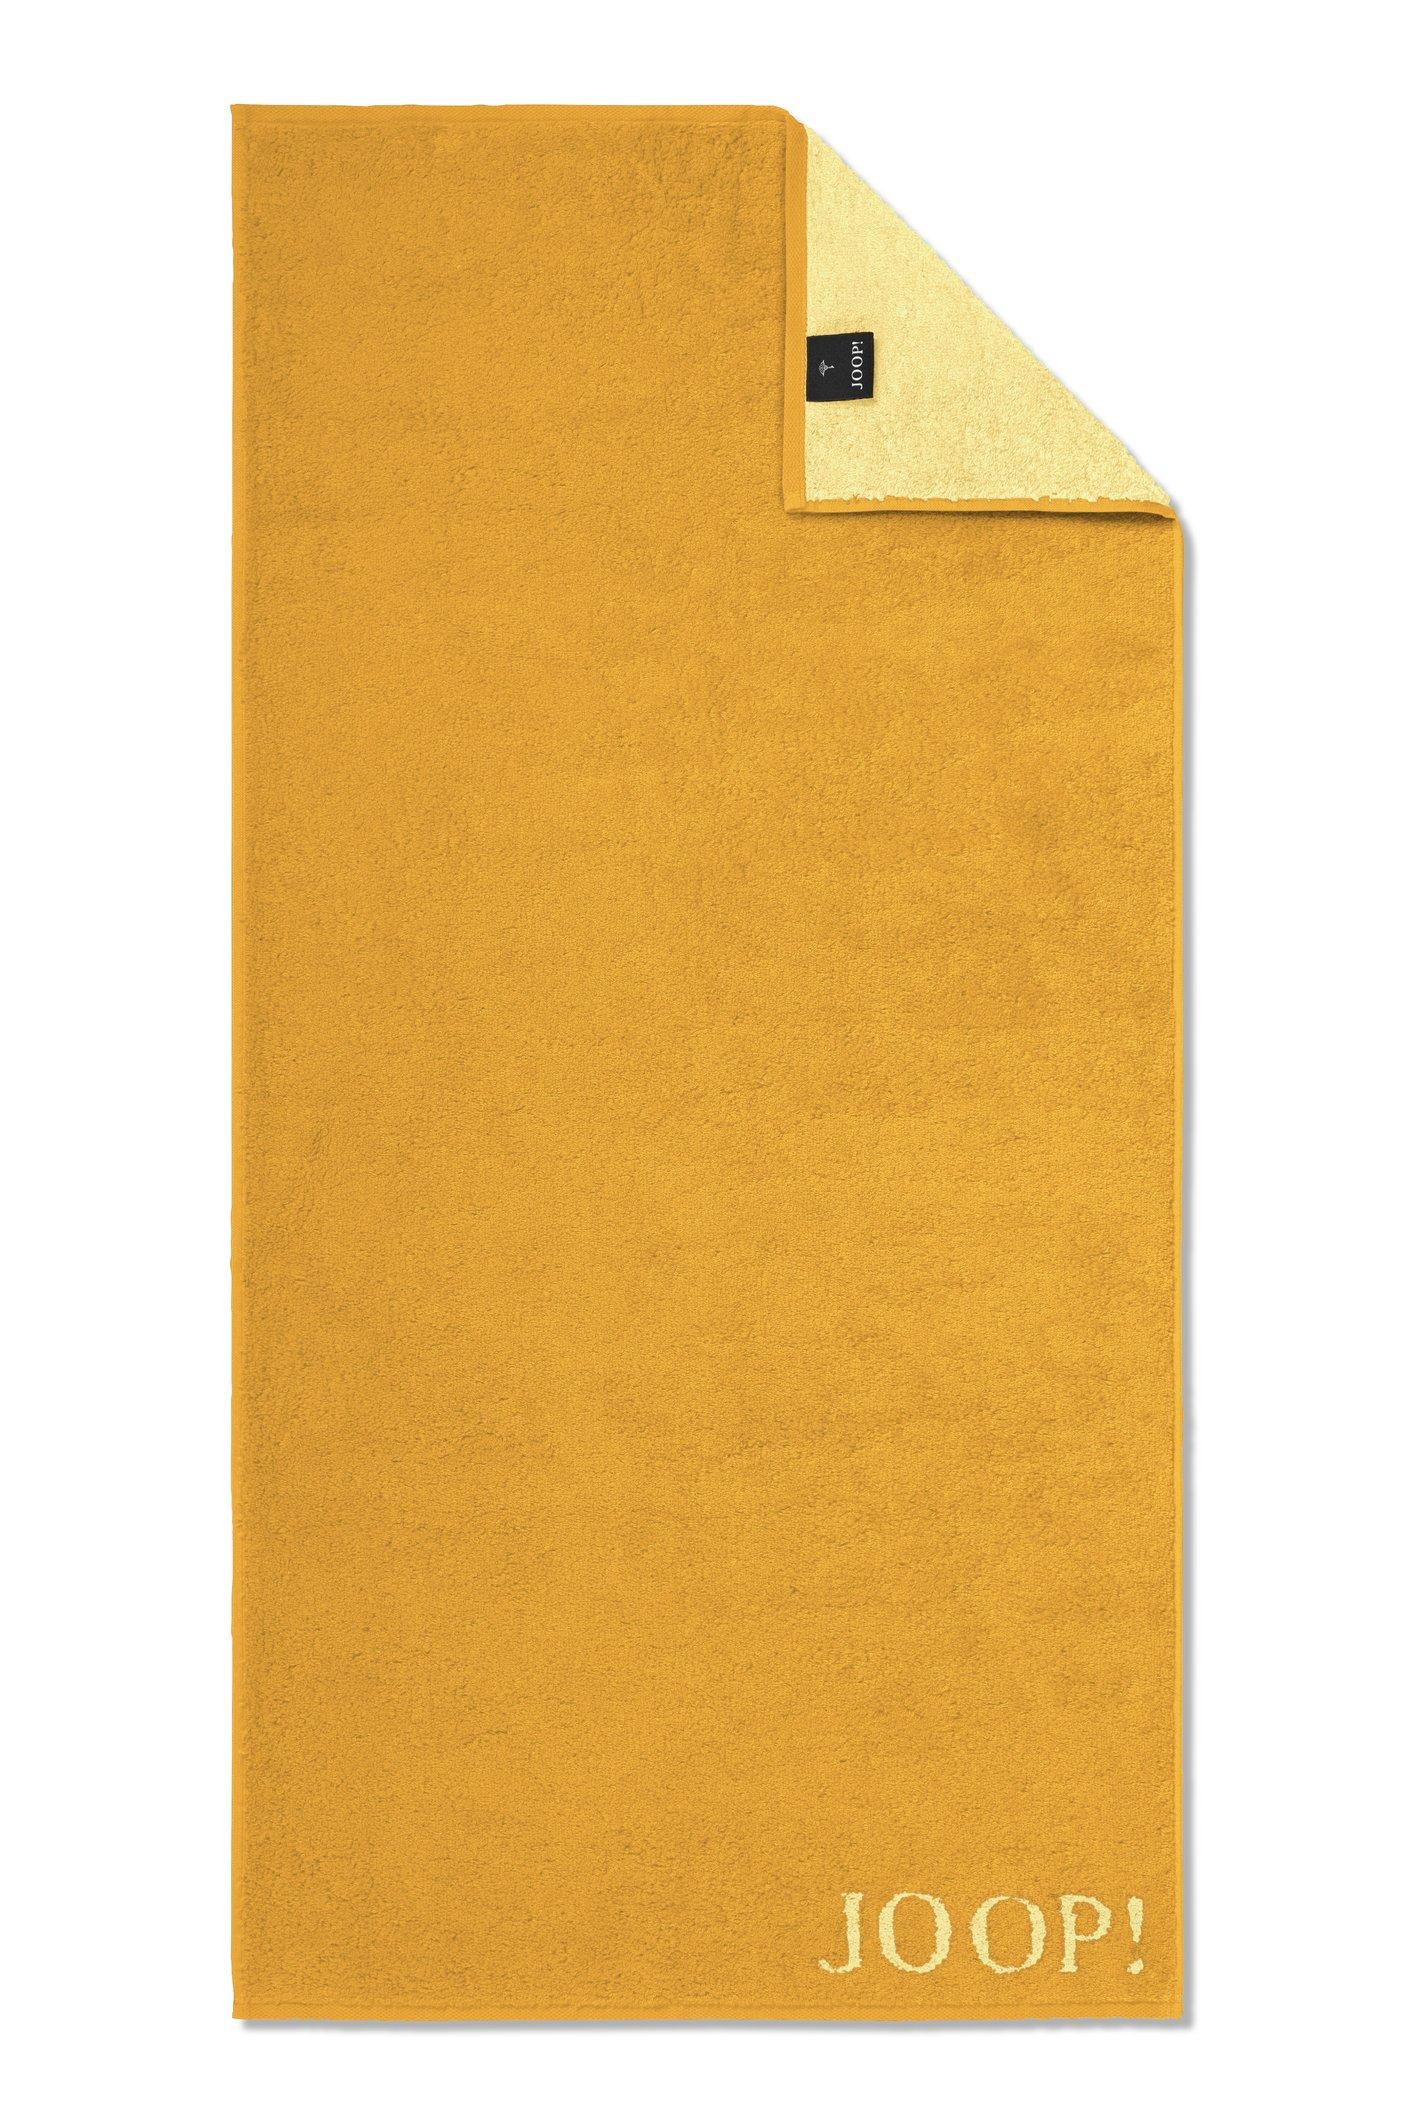 JOOP! Classic Doubleface Handtuch 50x100 cm 1600-50 Honig Kollektion 2020